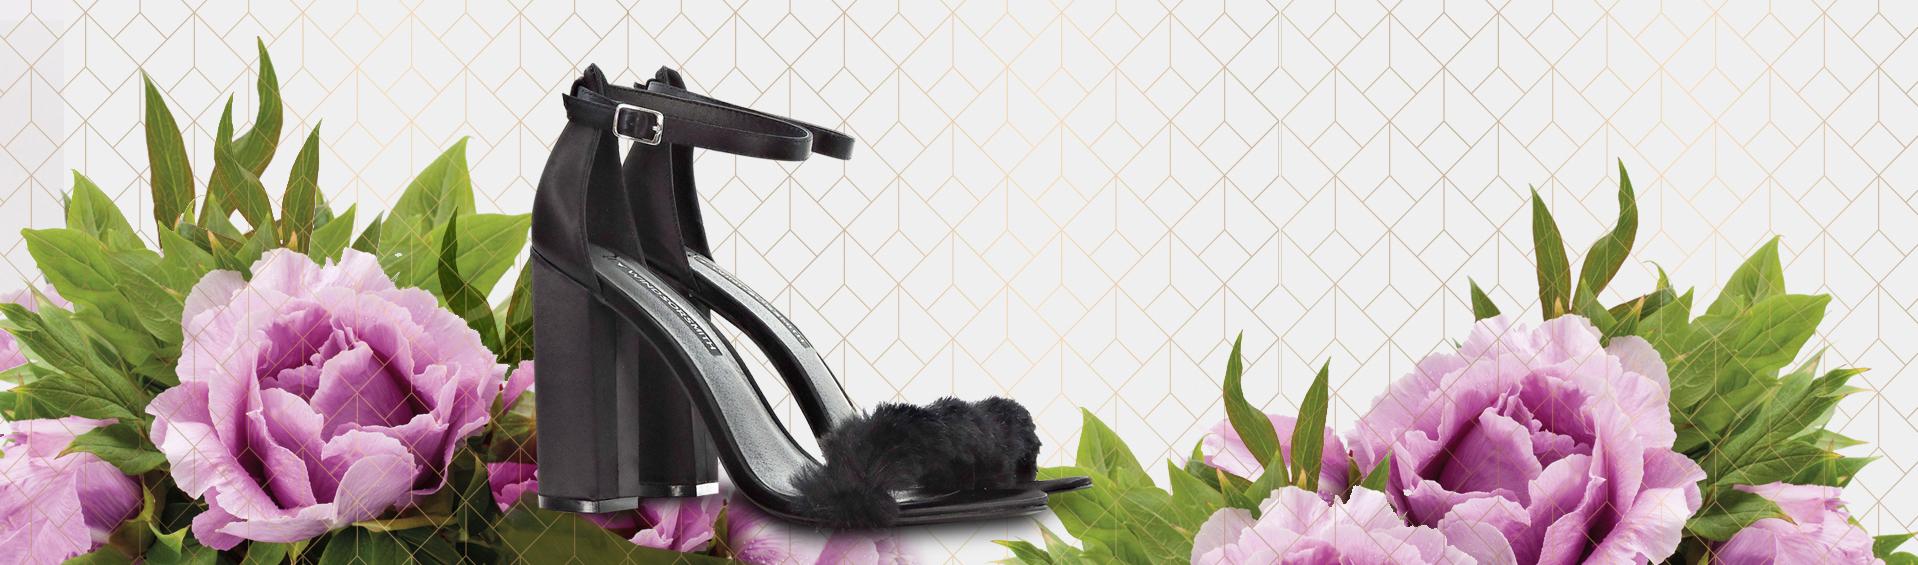 WINDSOR-SMITH-Iconic-Australian-Footwear